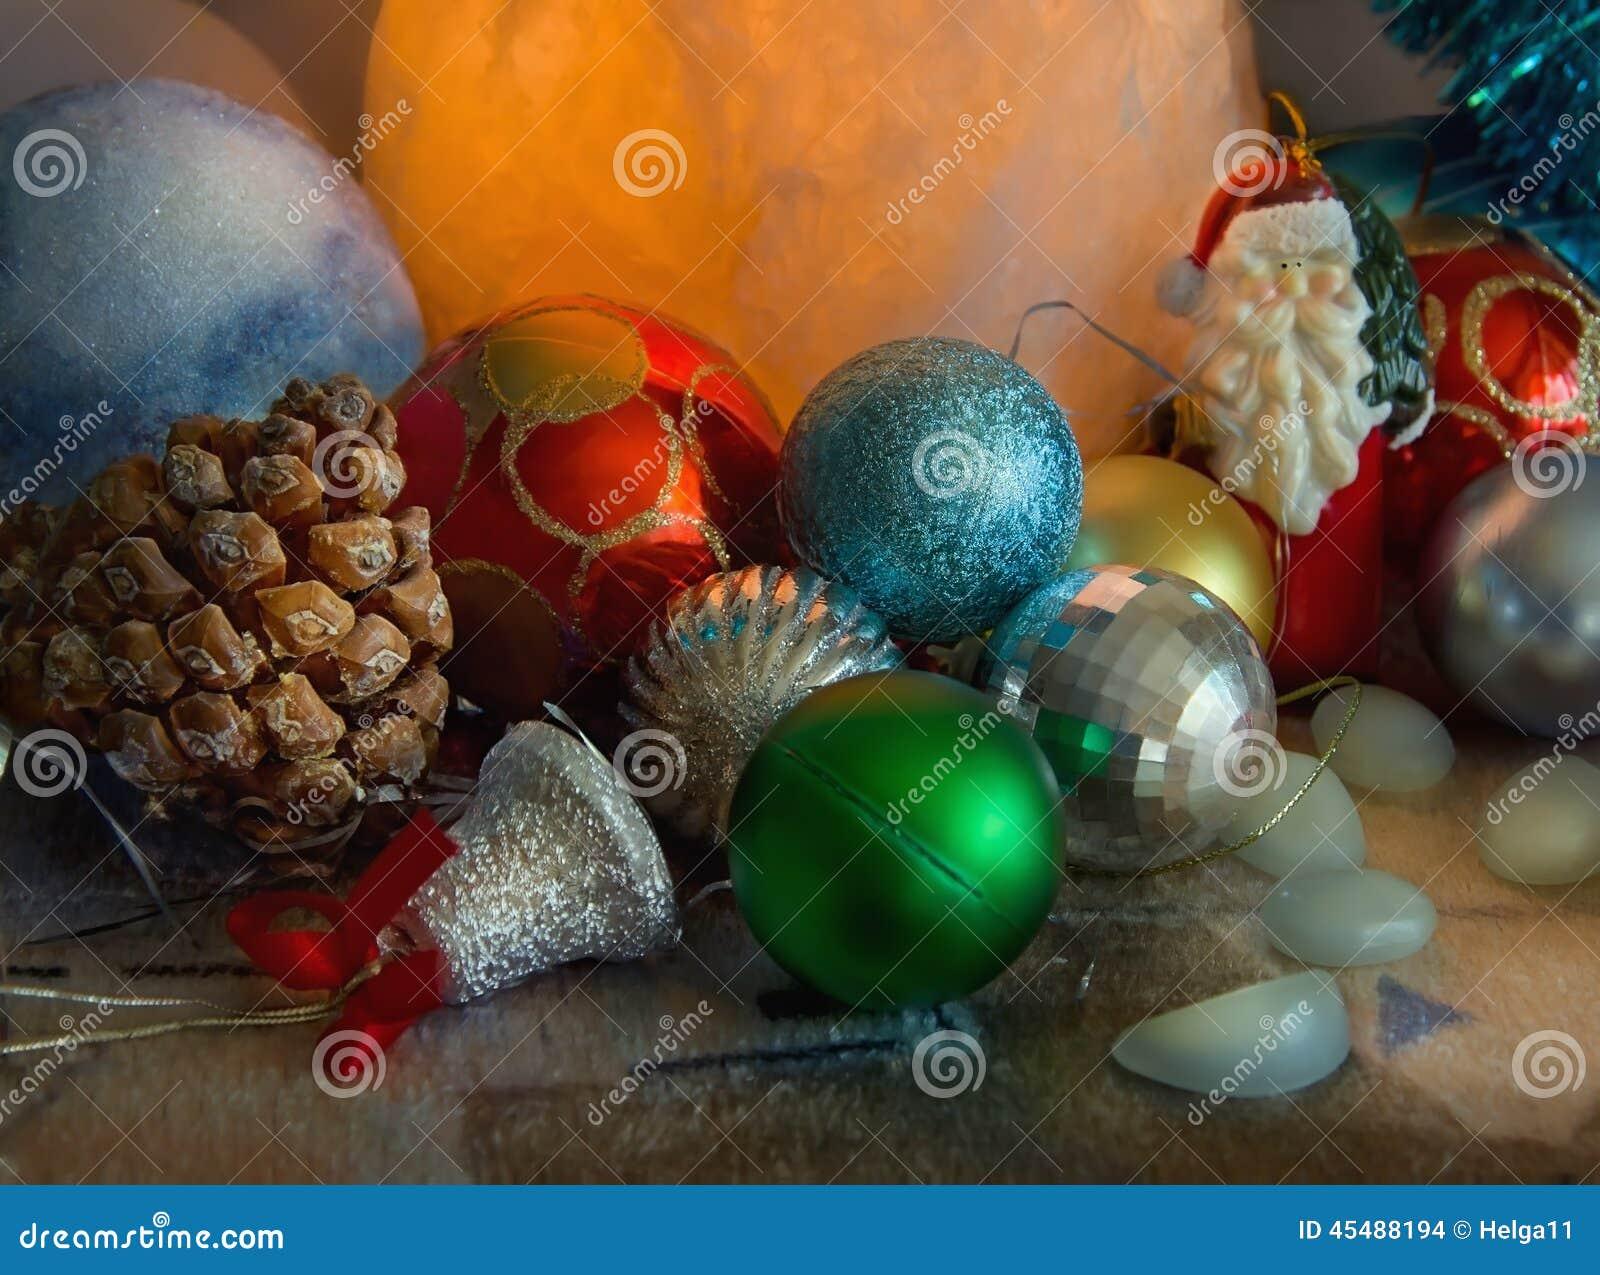 Salt Lamp Near Plants : Christmas Decorations Stock Photo - Image: 45488194